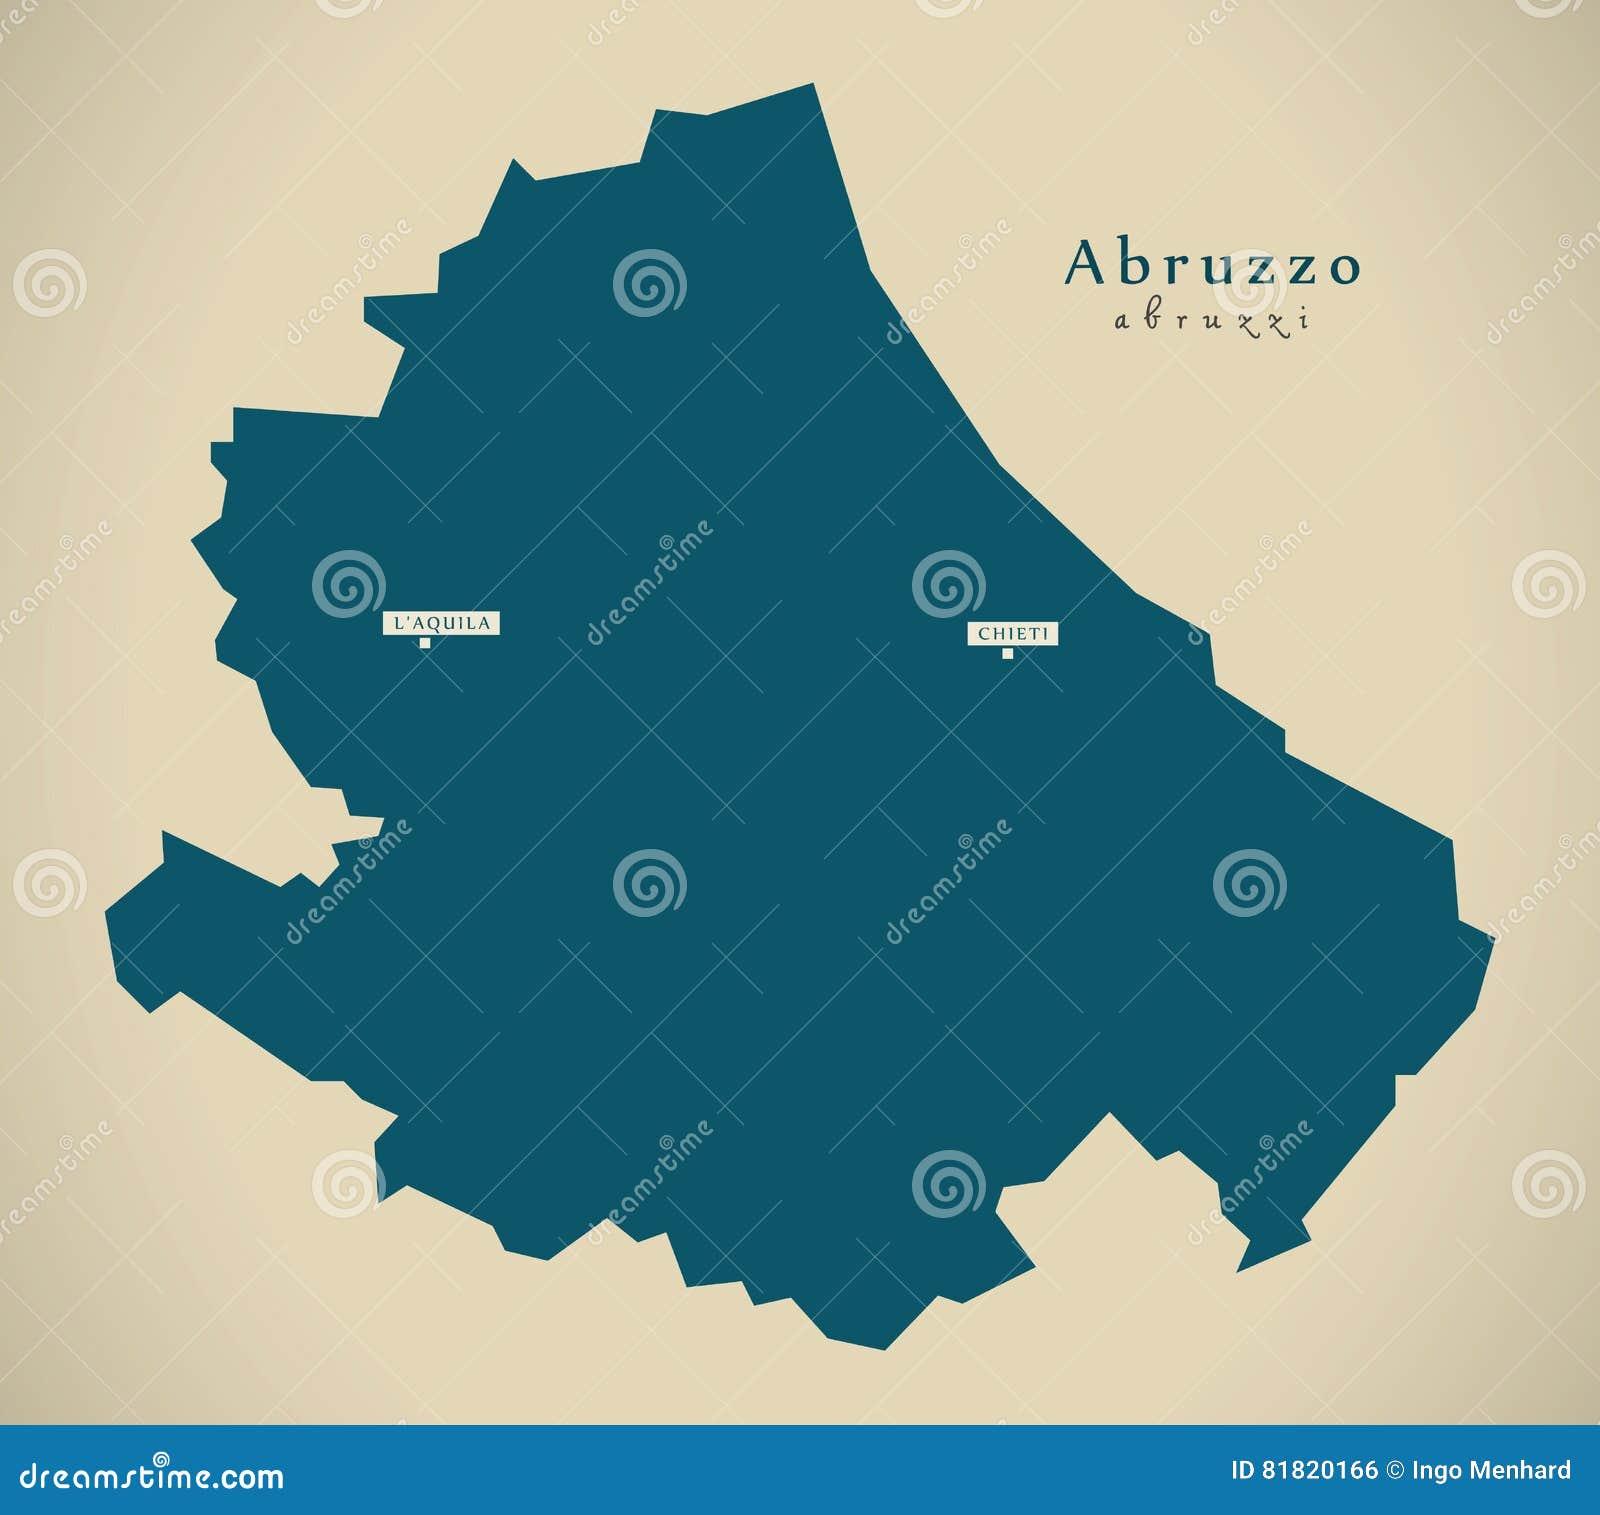 Modern Map Of Italy.Modern Map Abruzzo It Italy Stock Illustration Illustration Of